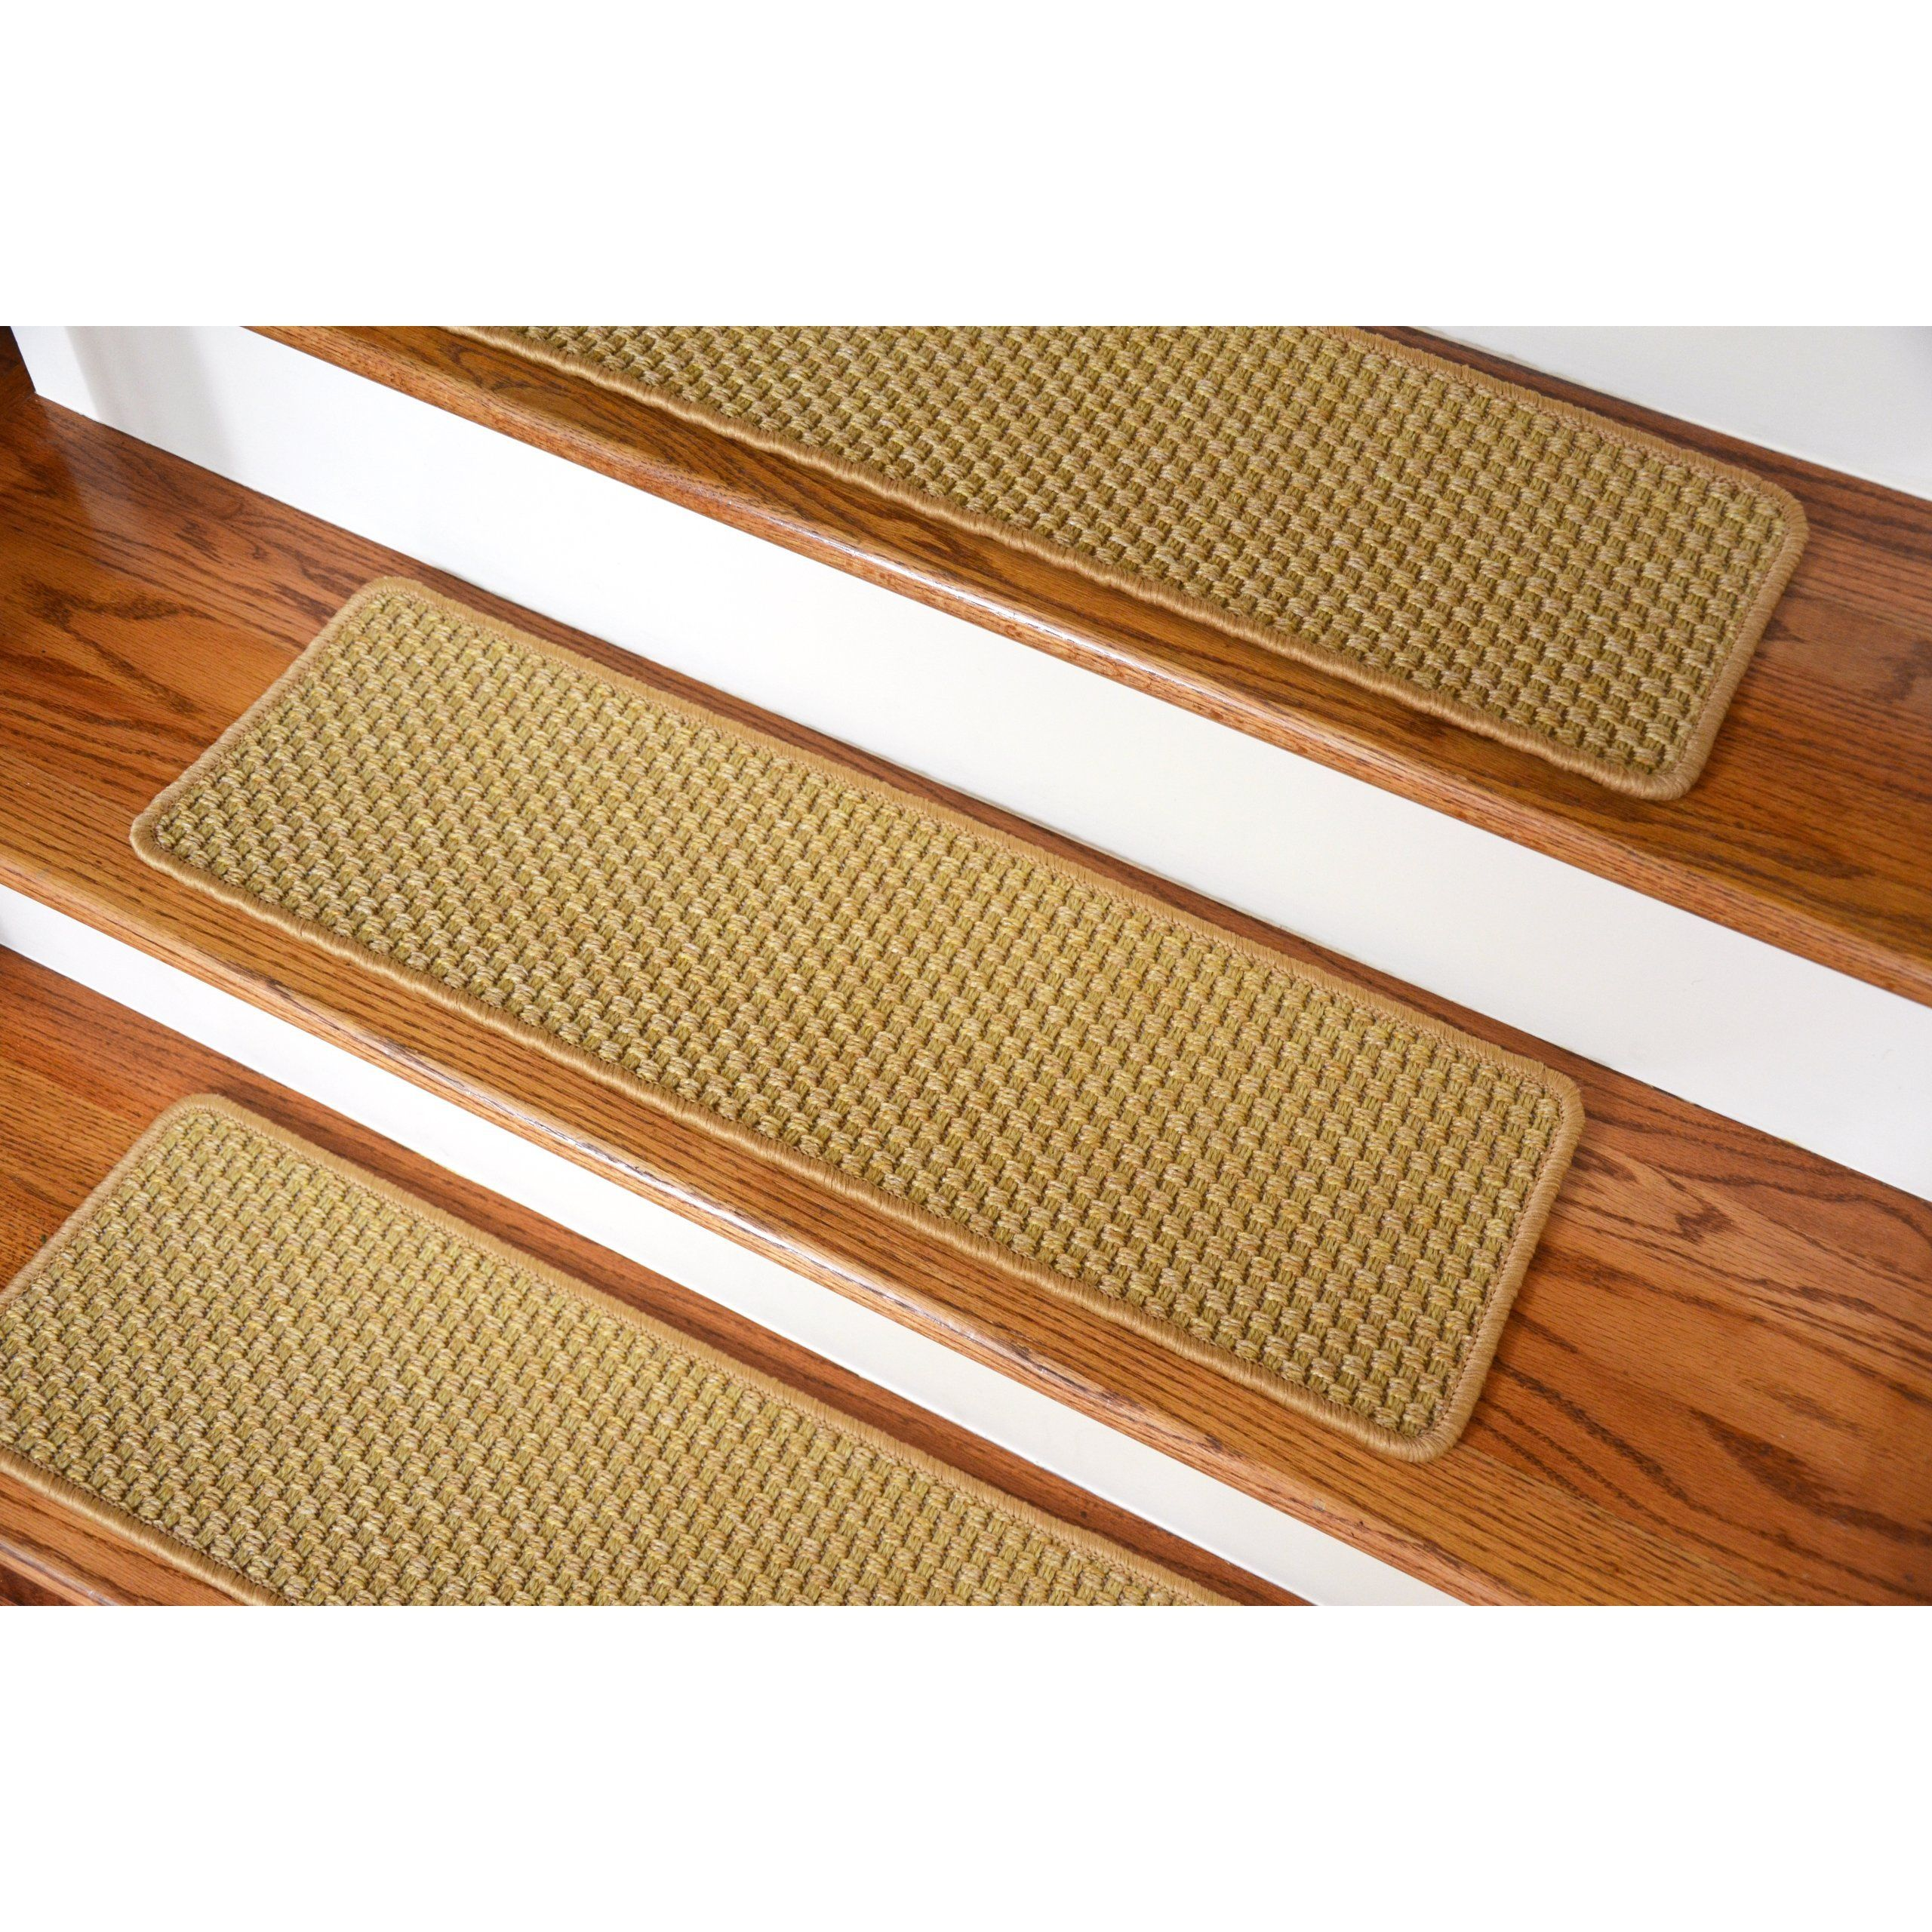 Merveilleux Dean Flooring Company Dean Indoor/Outdoor Flatweave Carpet Stair Treads    Madagascar Sisal (13